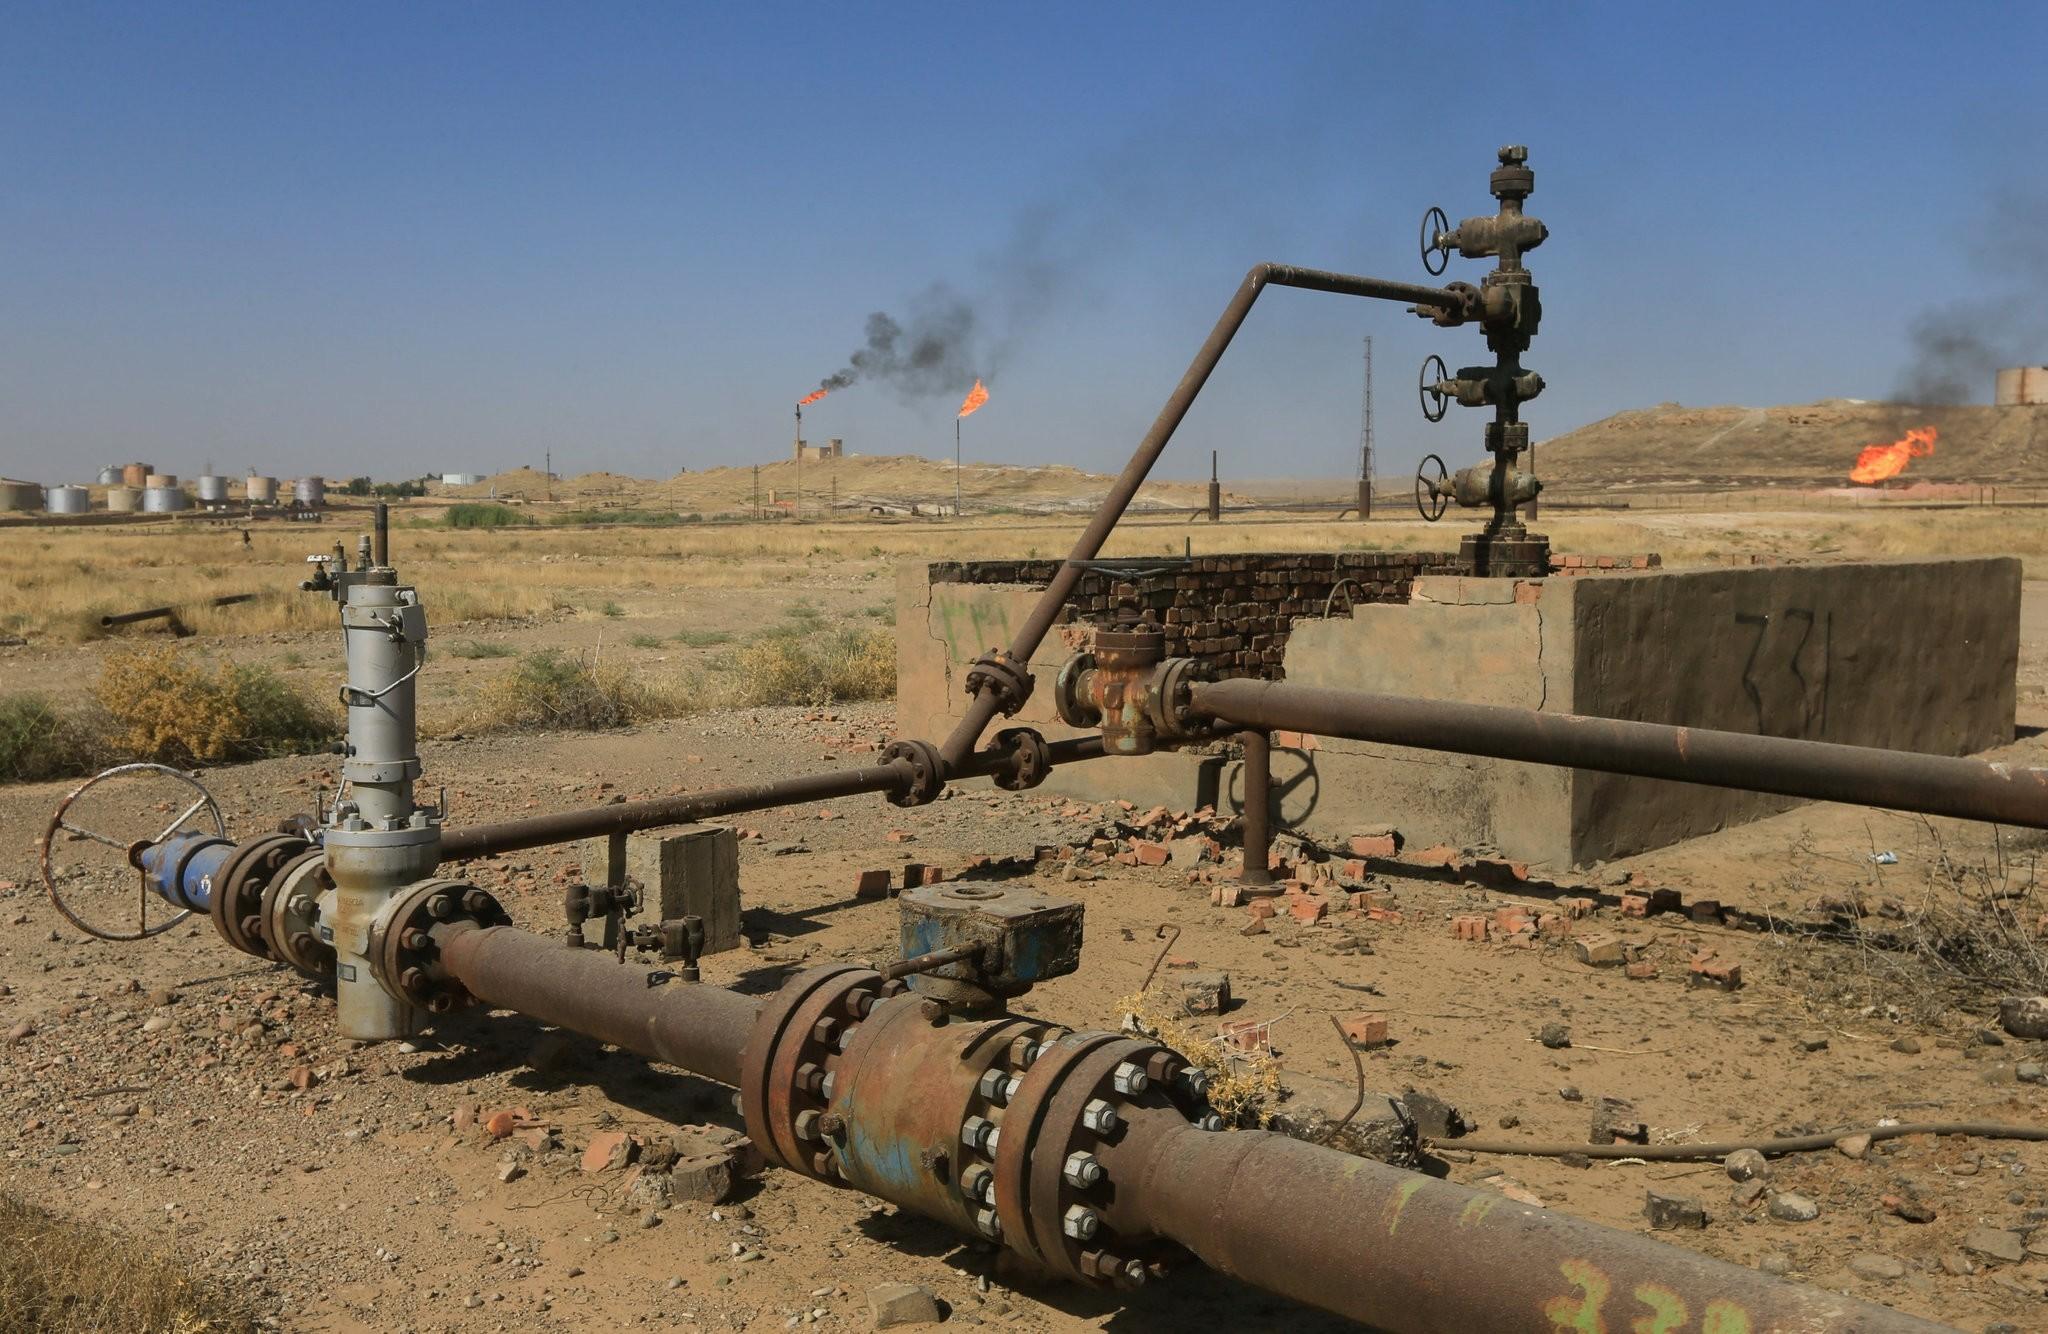 An oil field is seen in Kirkuk, Iraq, Oct. 18, 2017. (Reuters Photo)